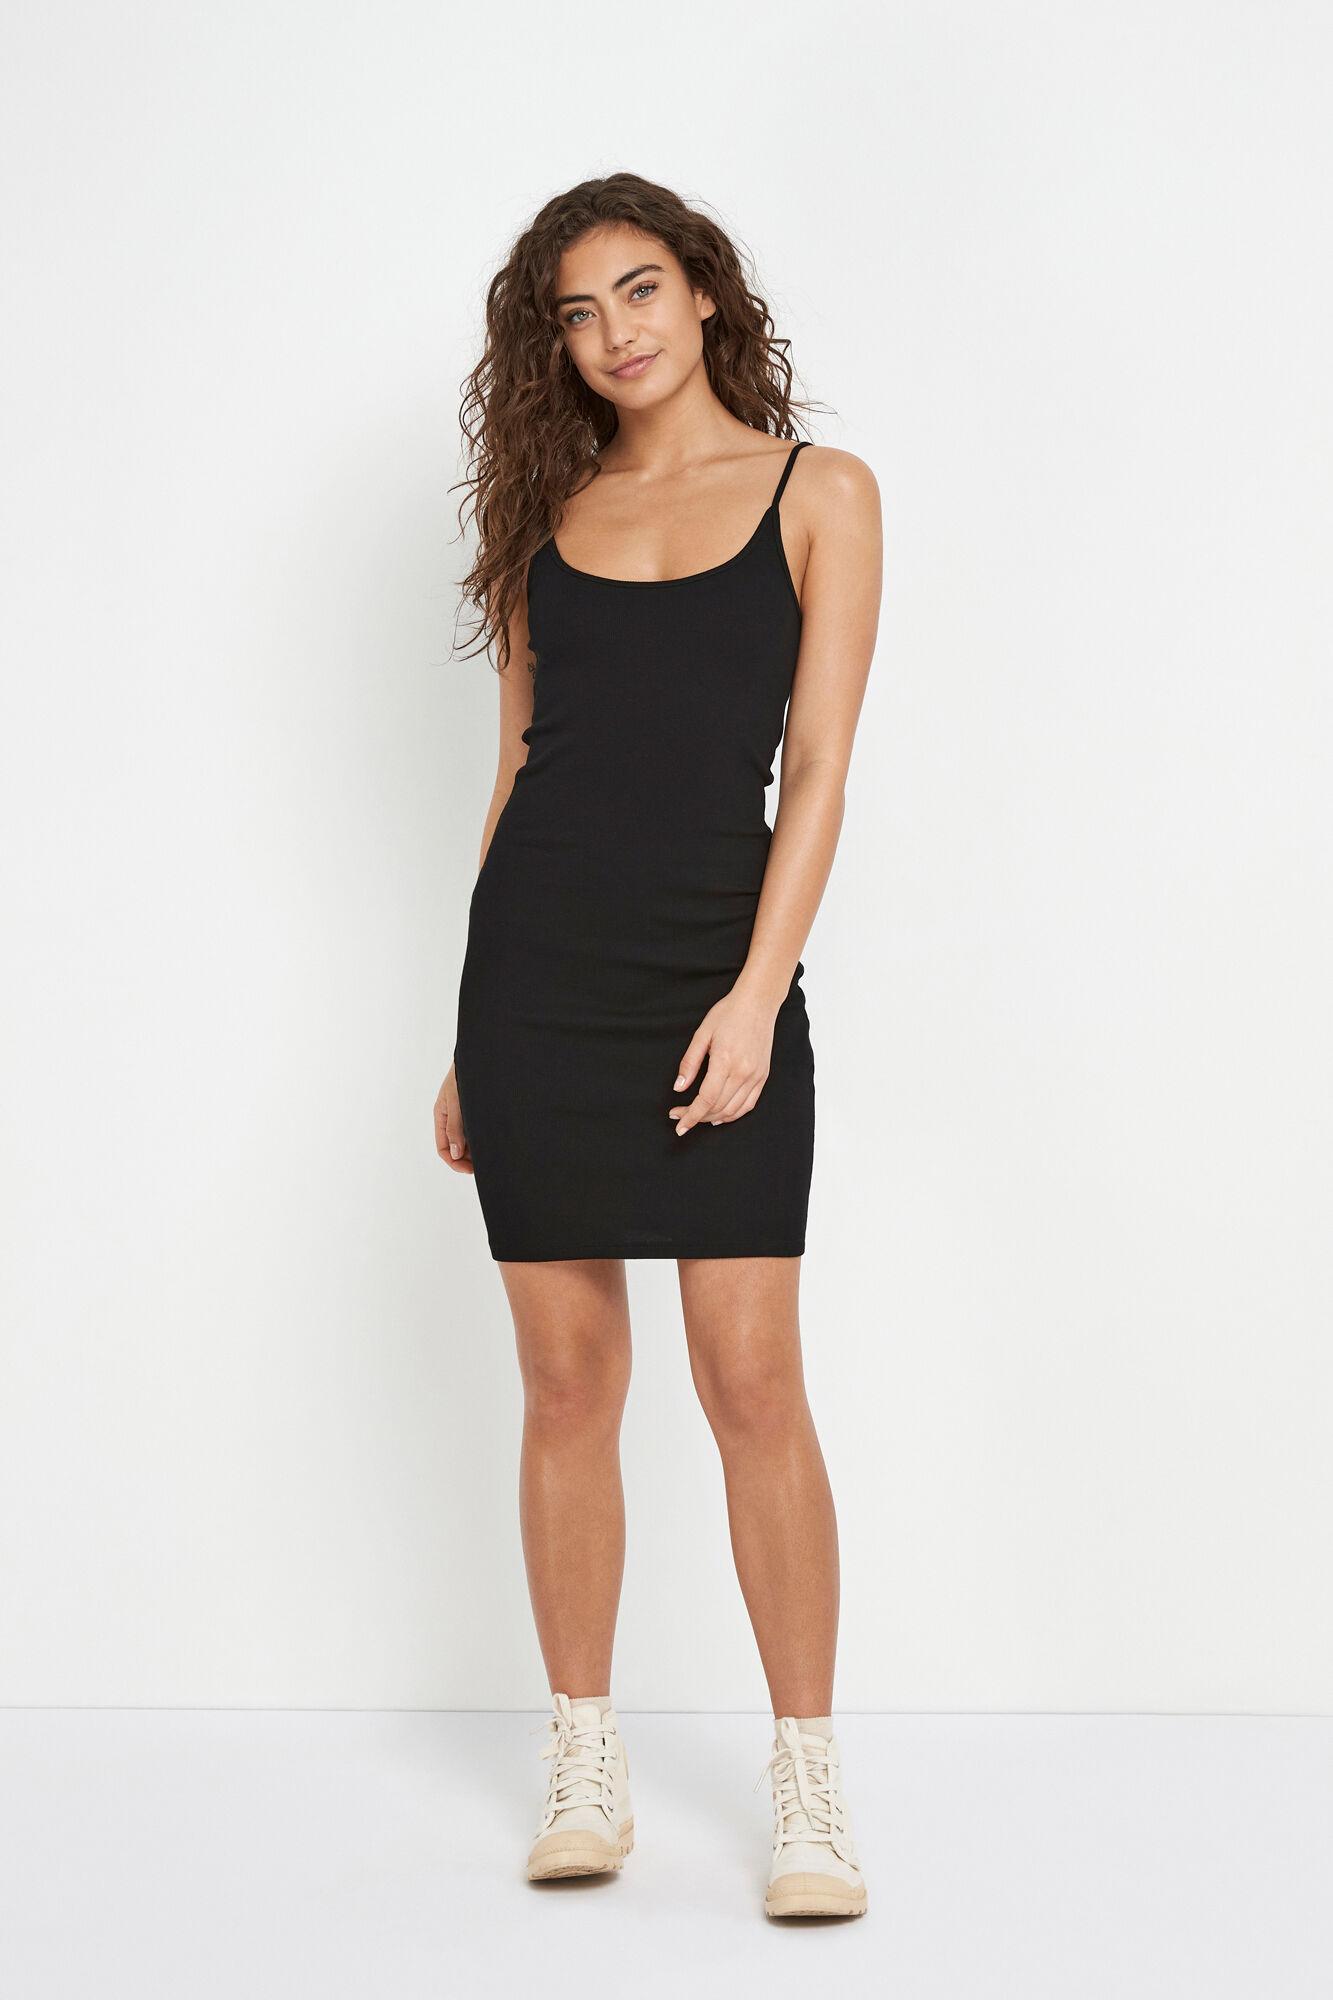 ENALLY SL SHORT DRESS 5314, BLACK